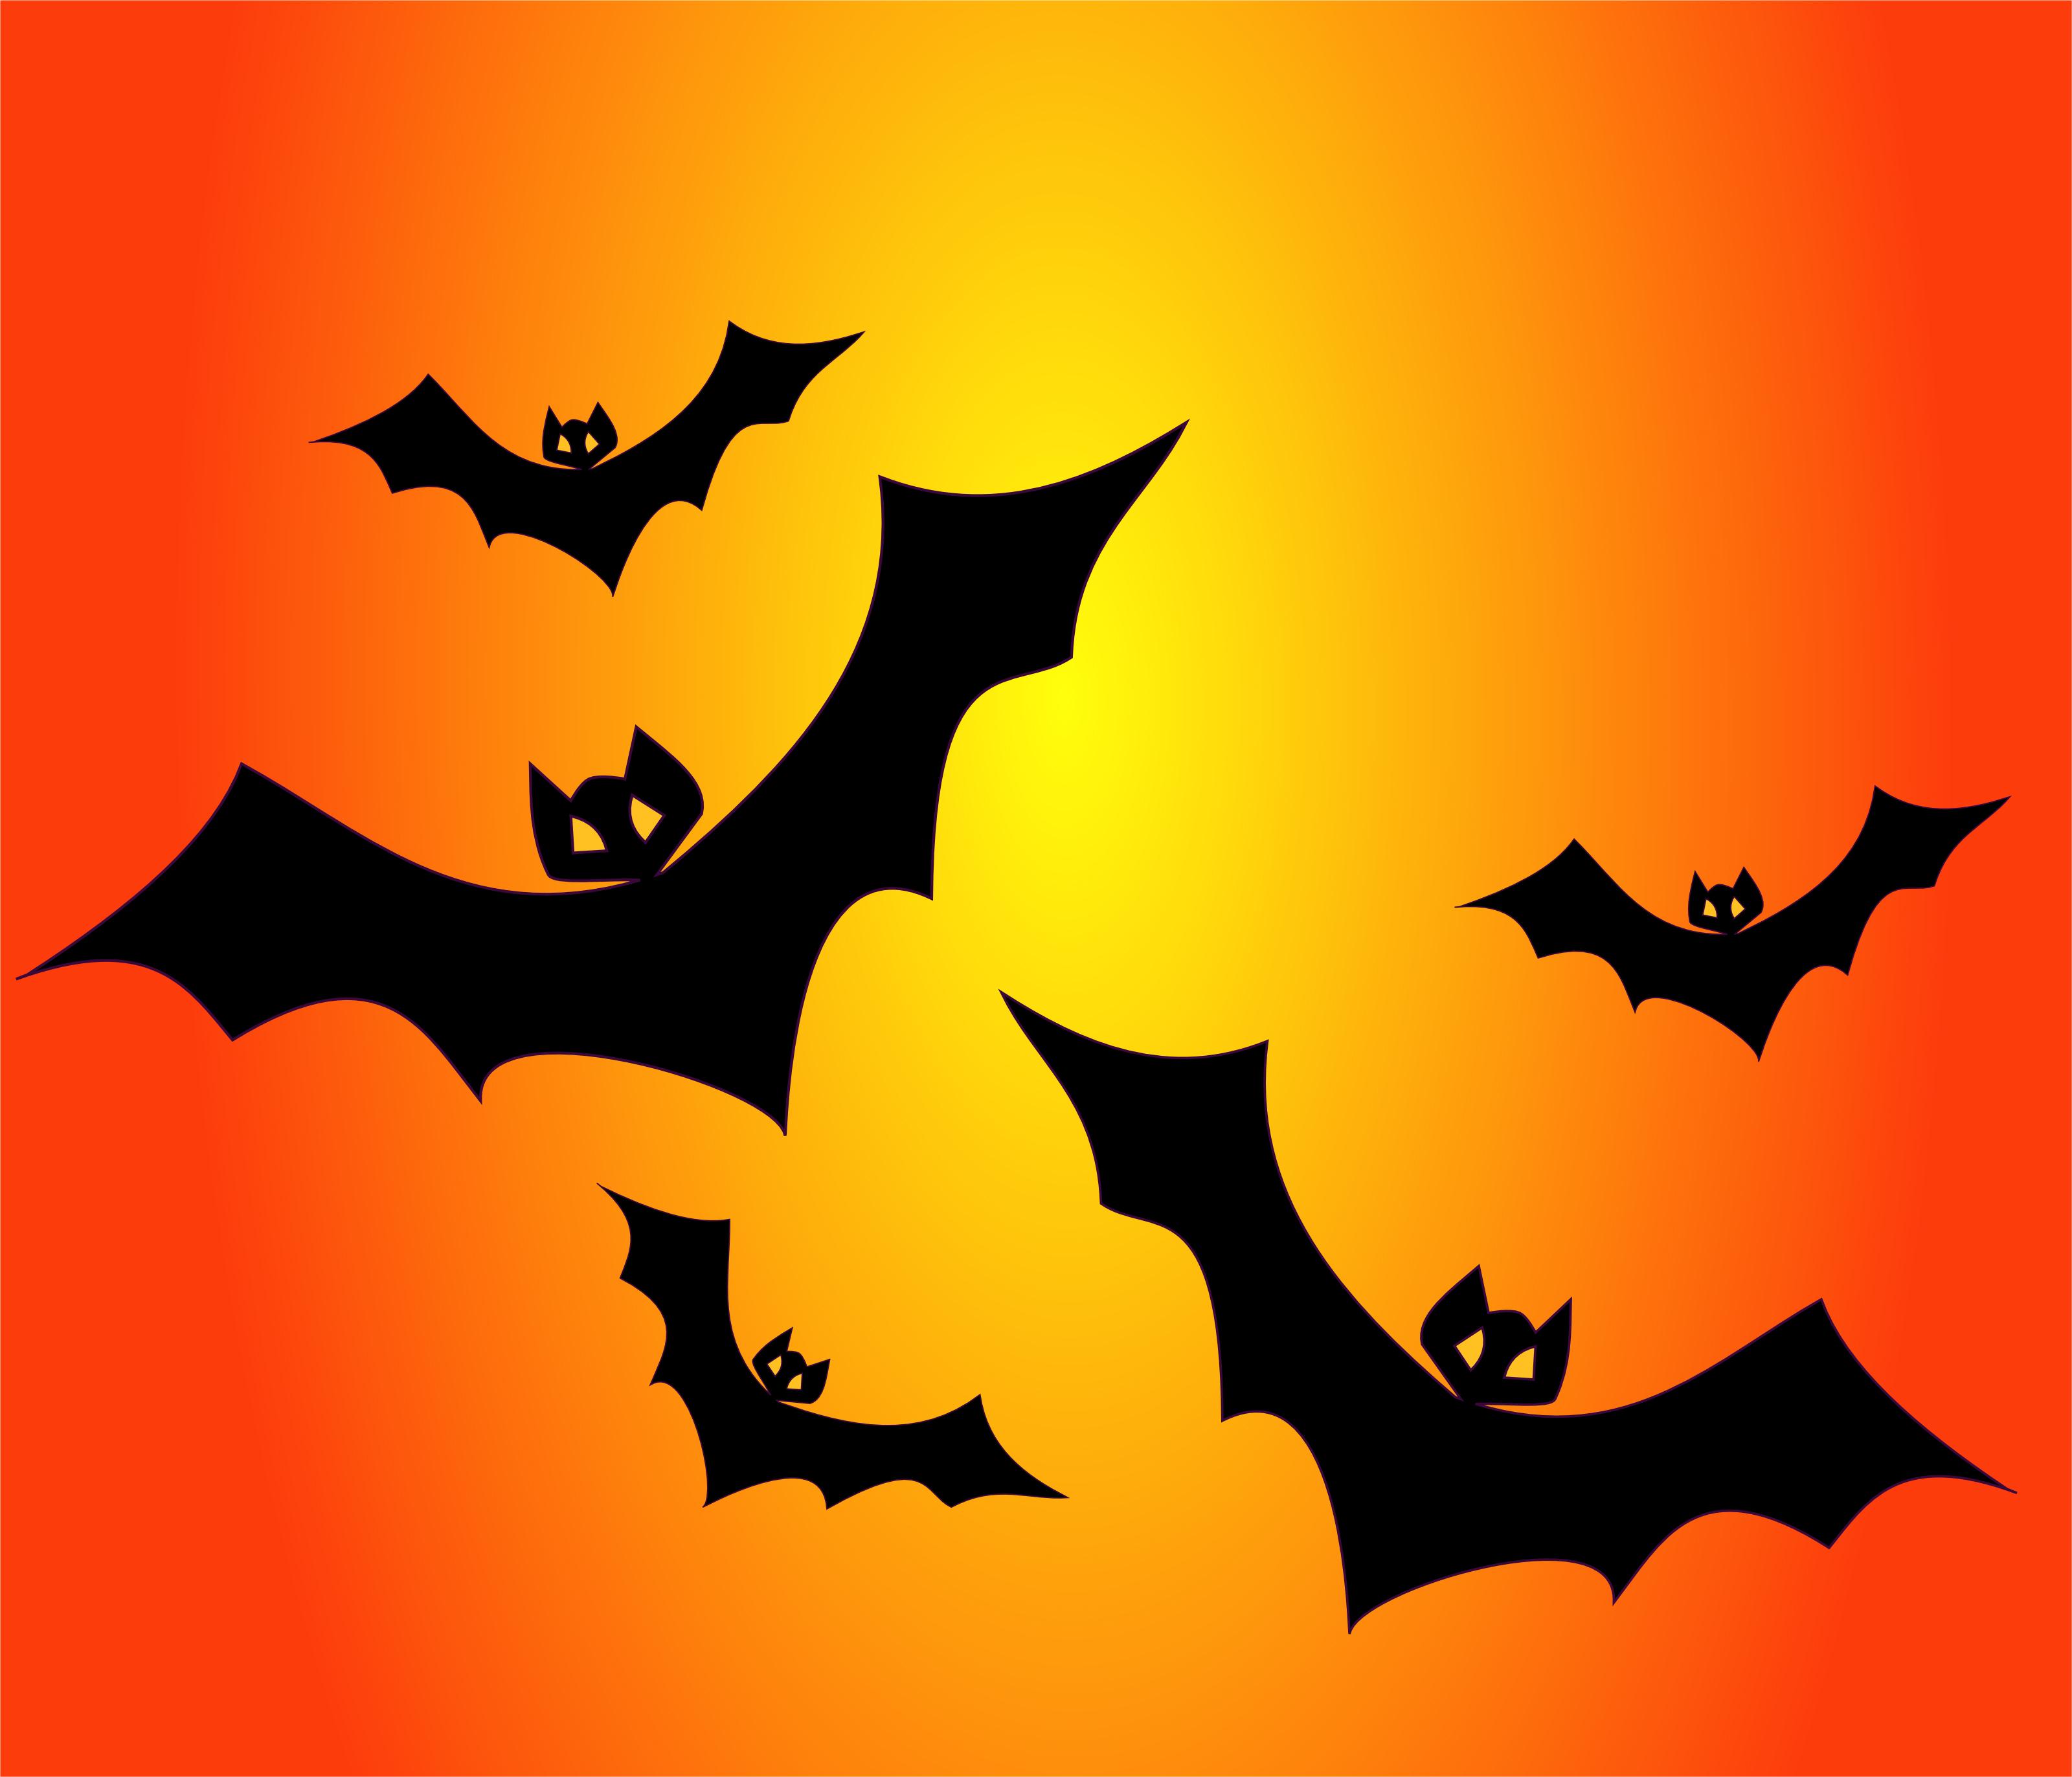 bats on orange free halloween vector clipart illustration - Halloween Bat Pics